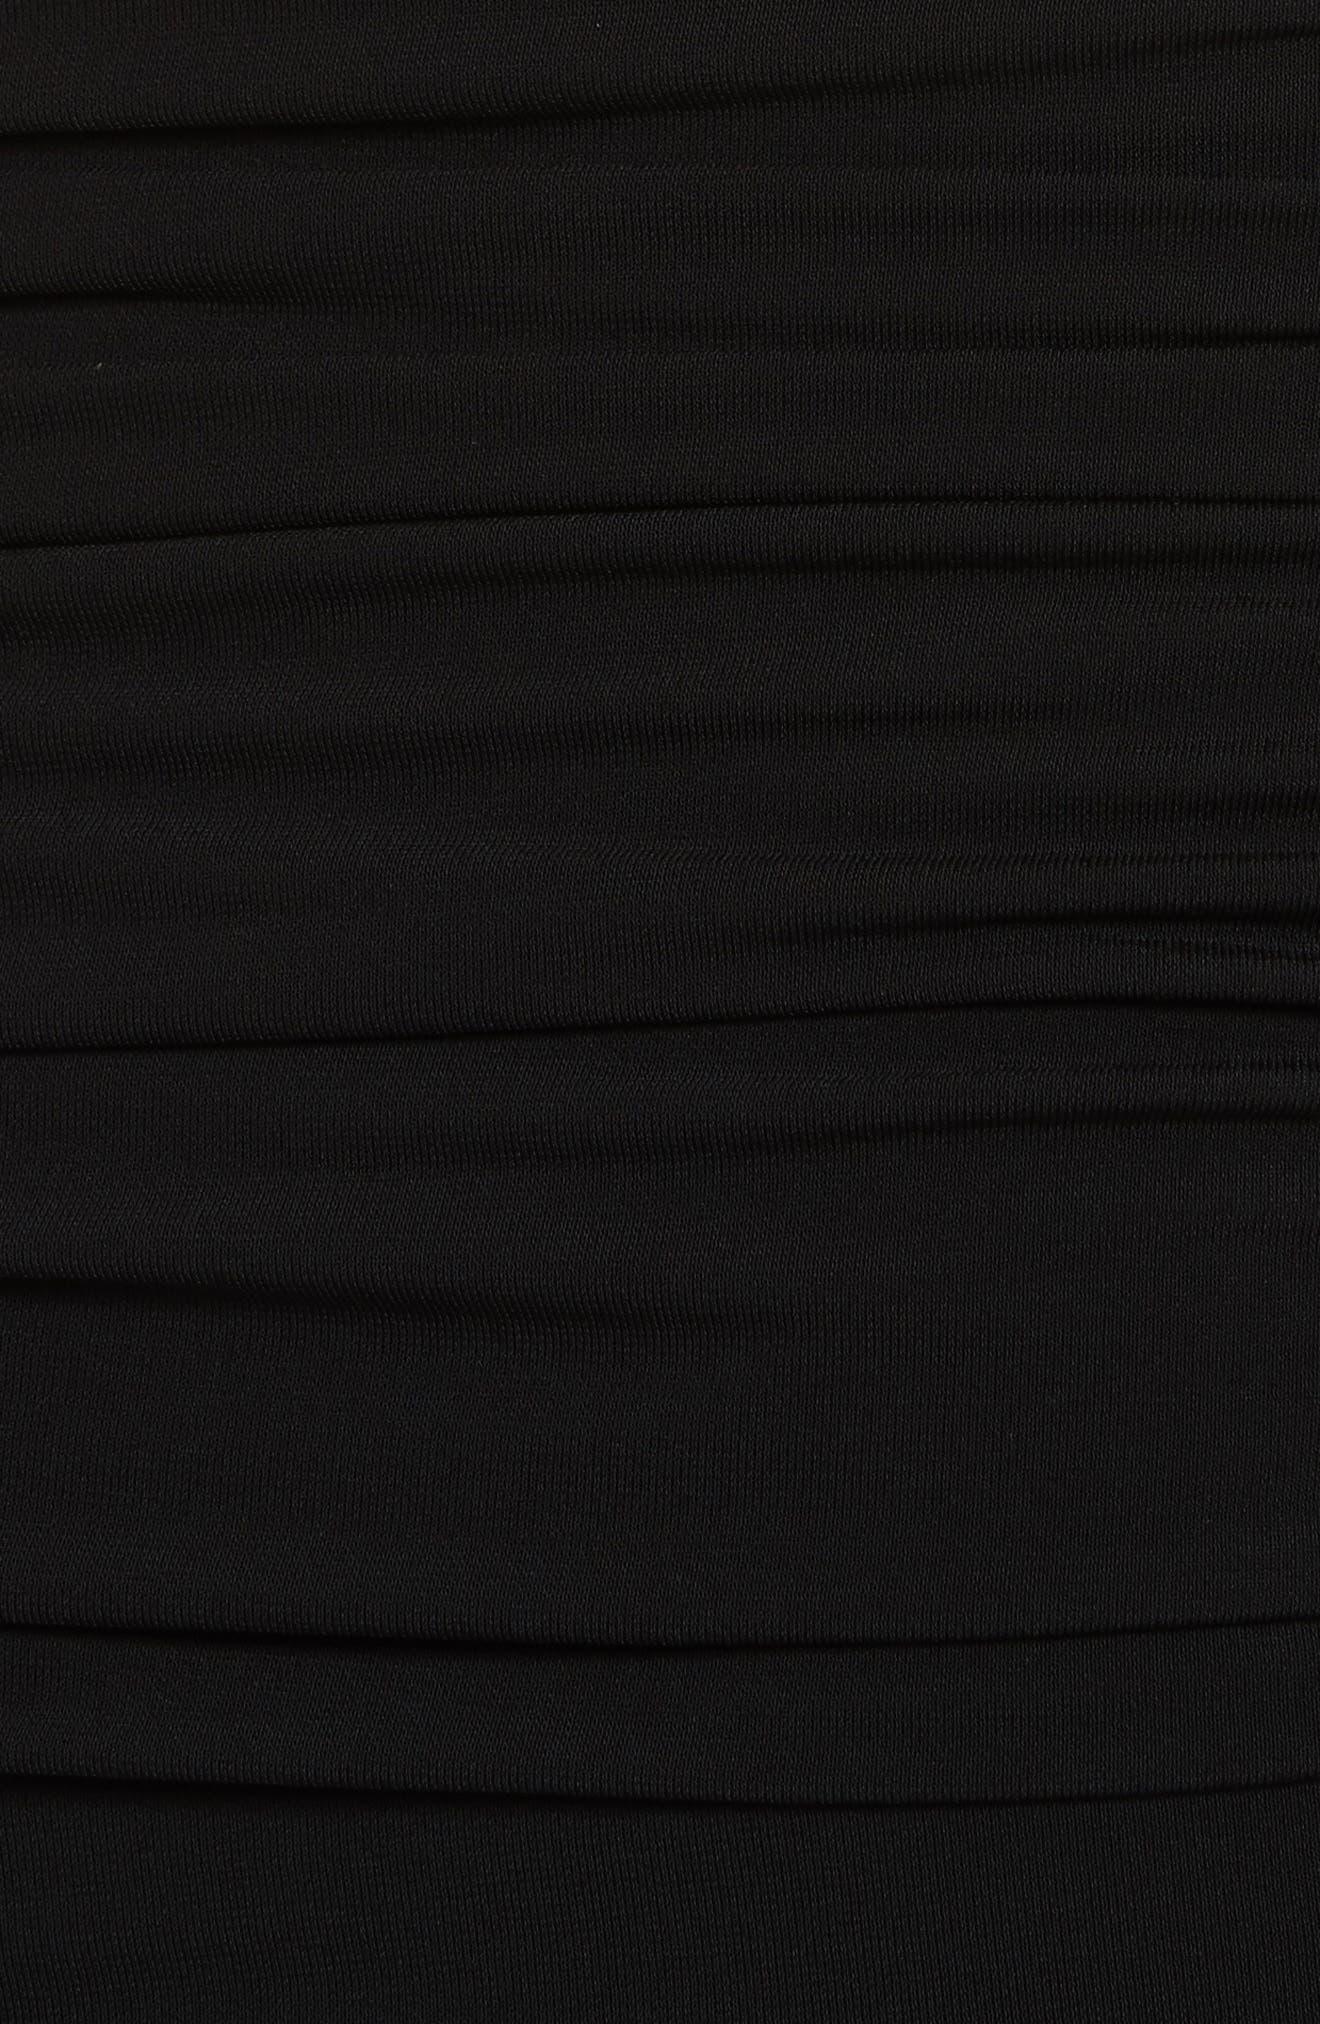 Blaise Off the Shoulder Ruched Dress,                             Alternate thumbnail 5, color,                             Black